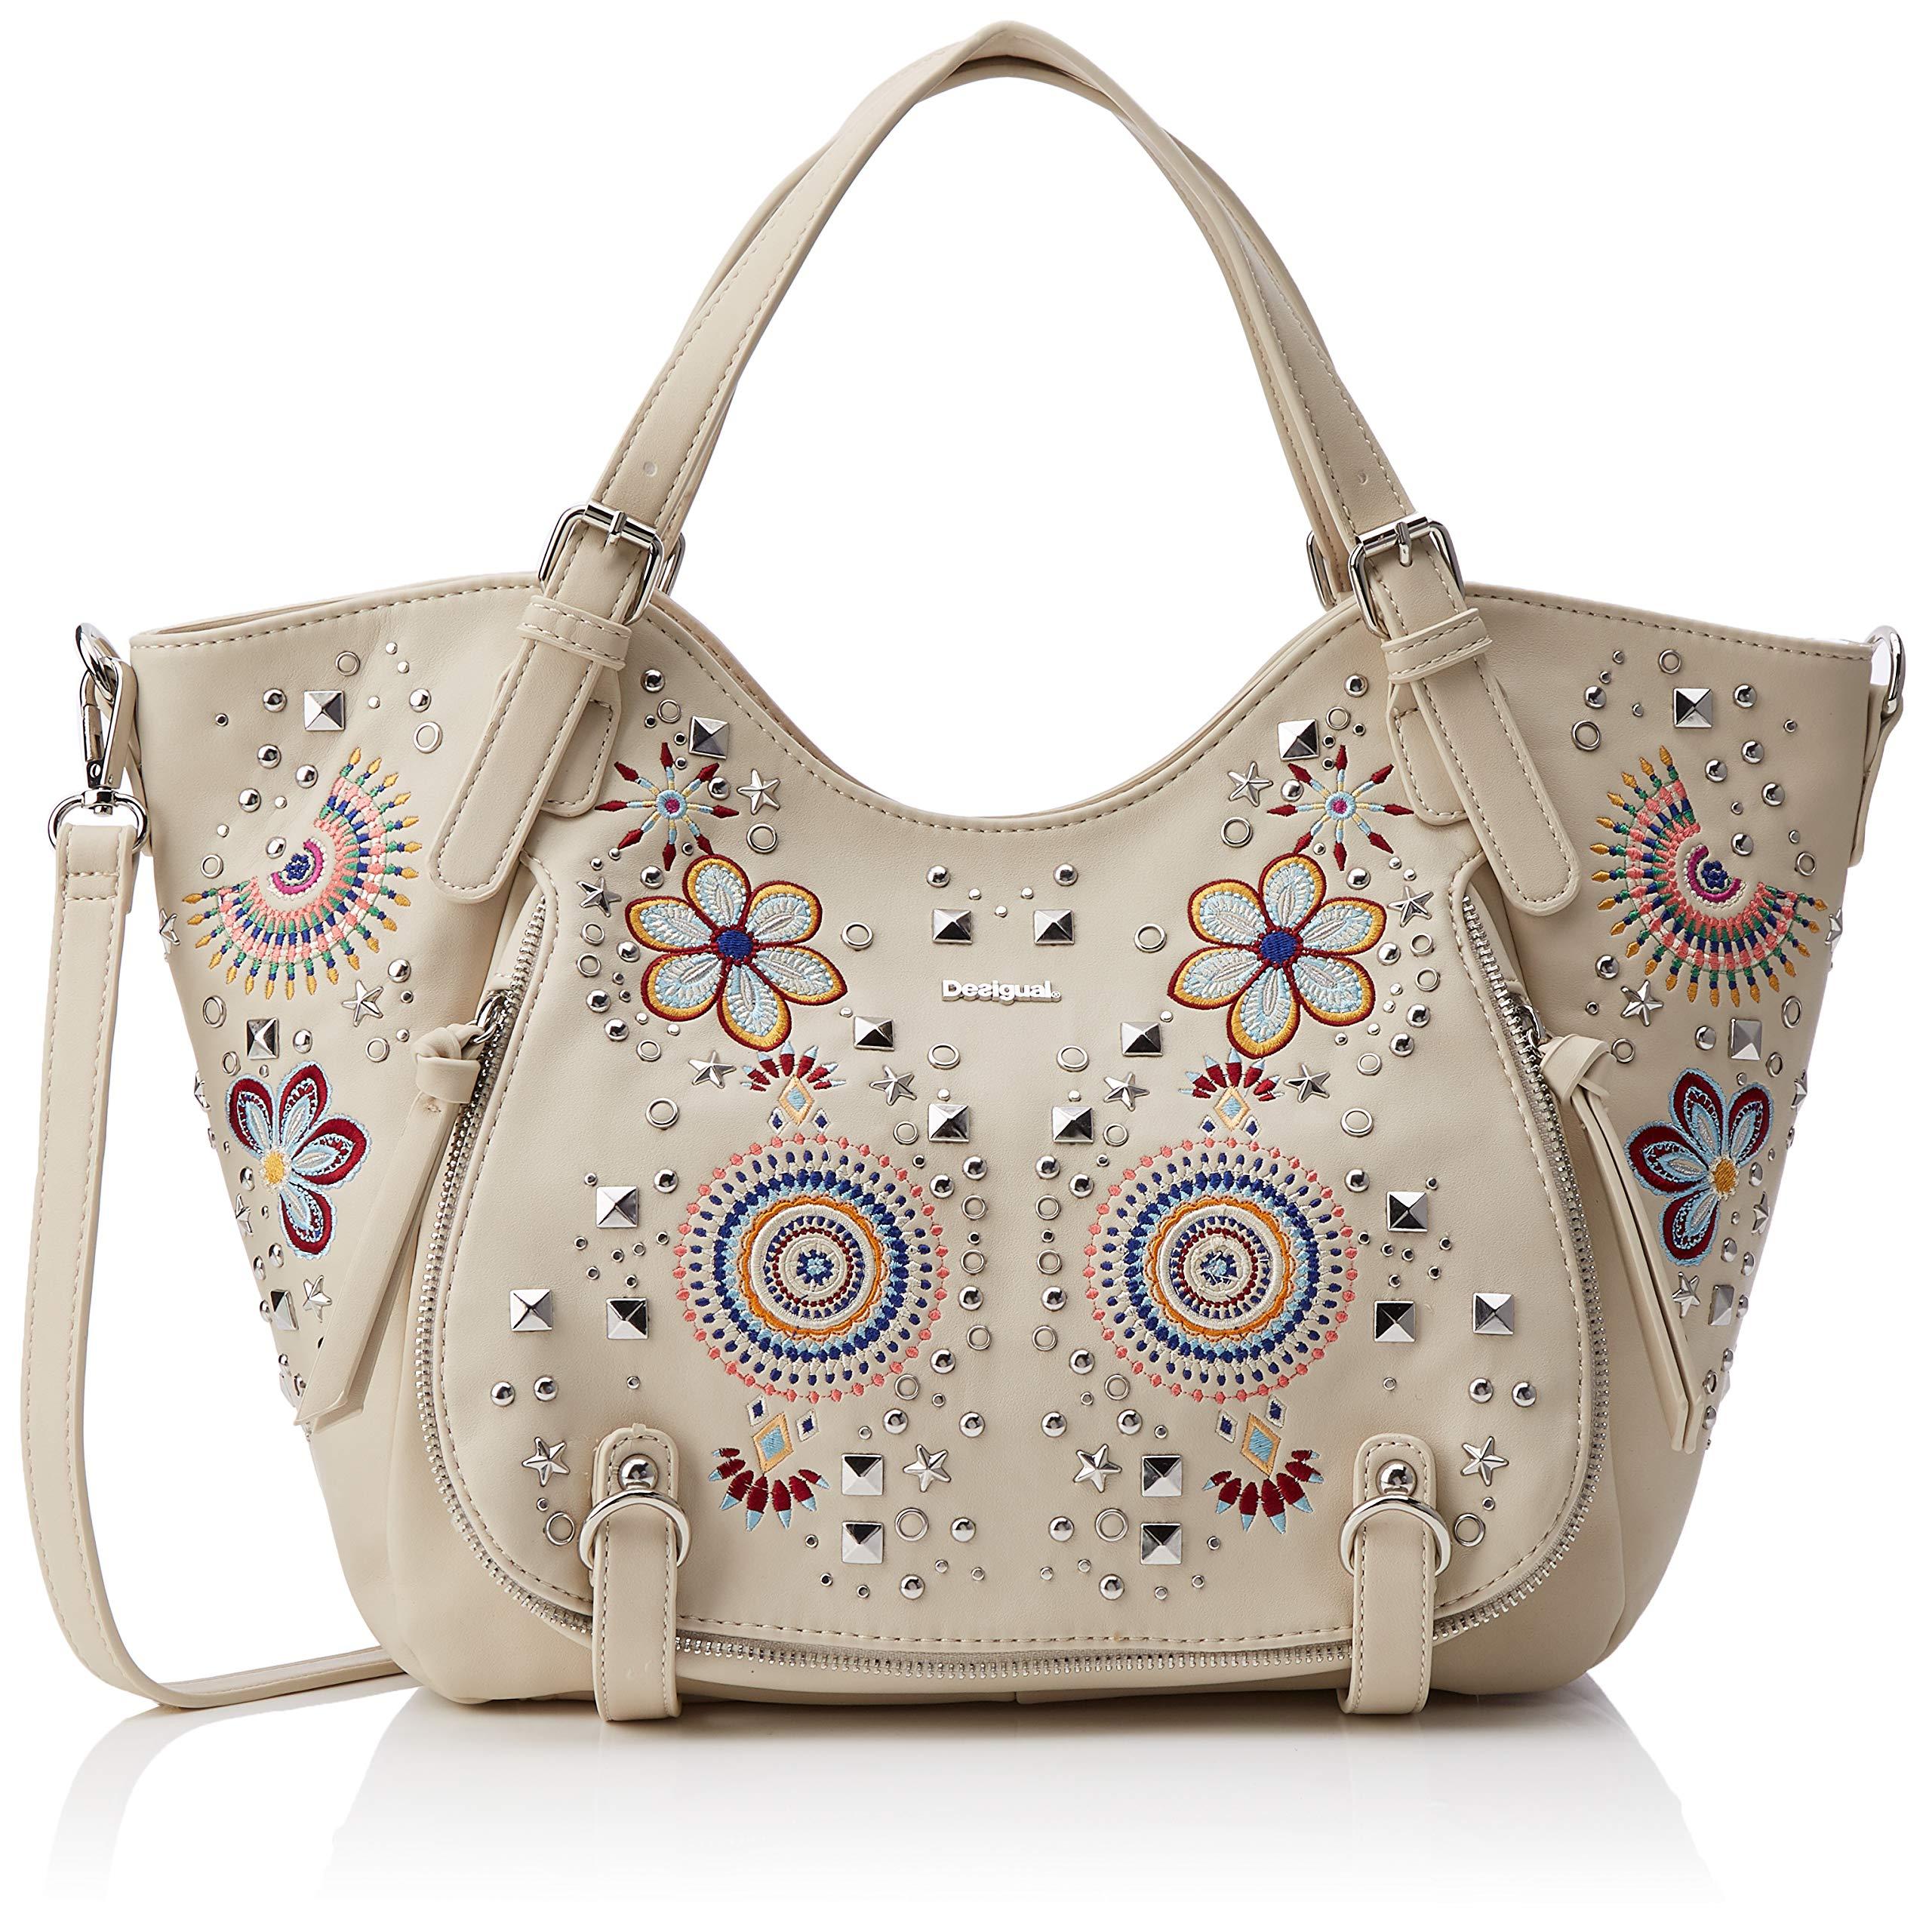 Desigual Bag Apolo Rotterdam Women Shoppers y bolsos de hombro Mujer